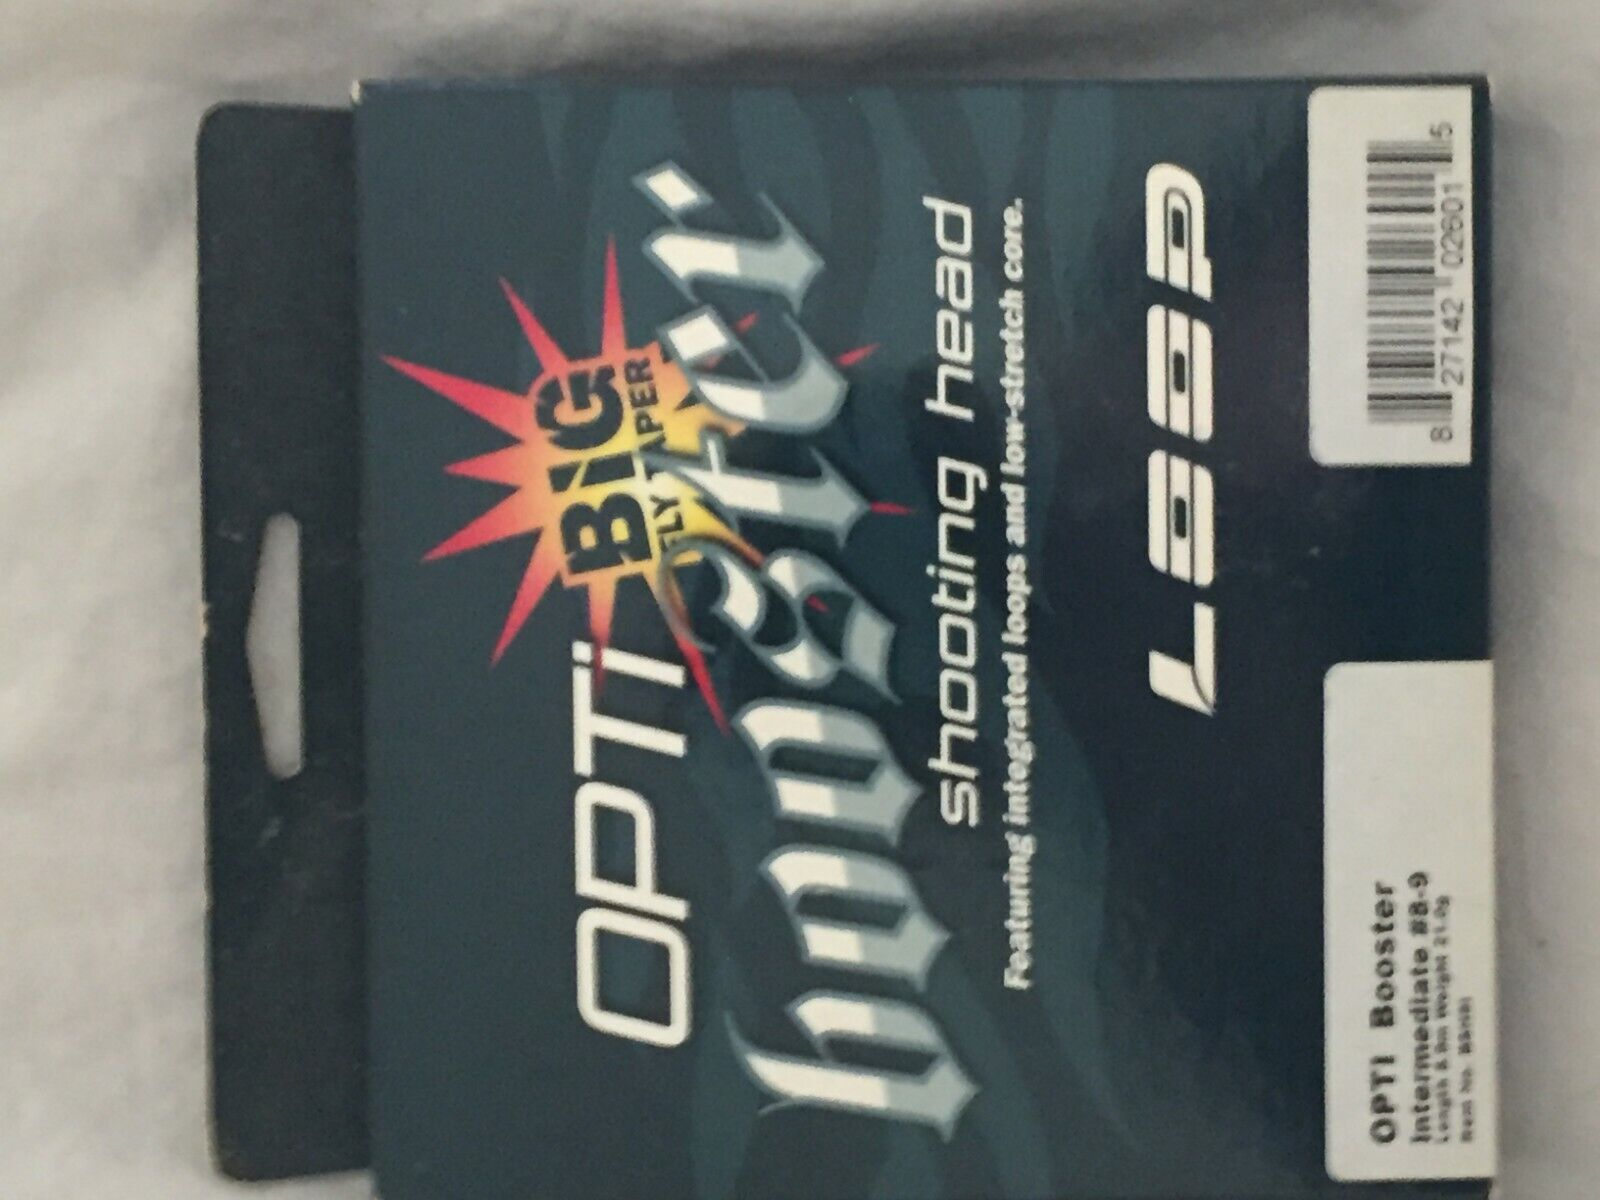 Loop Opti Intermediate Booster 8-9 wt (Big Fly Taper Shooting Head ) New in Box